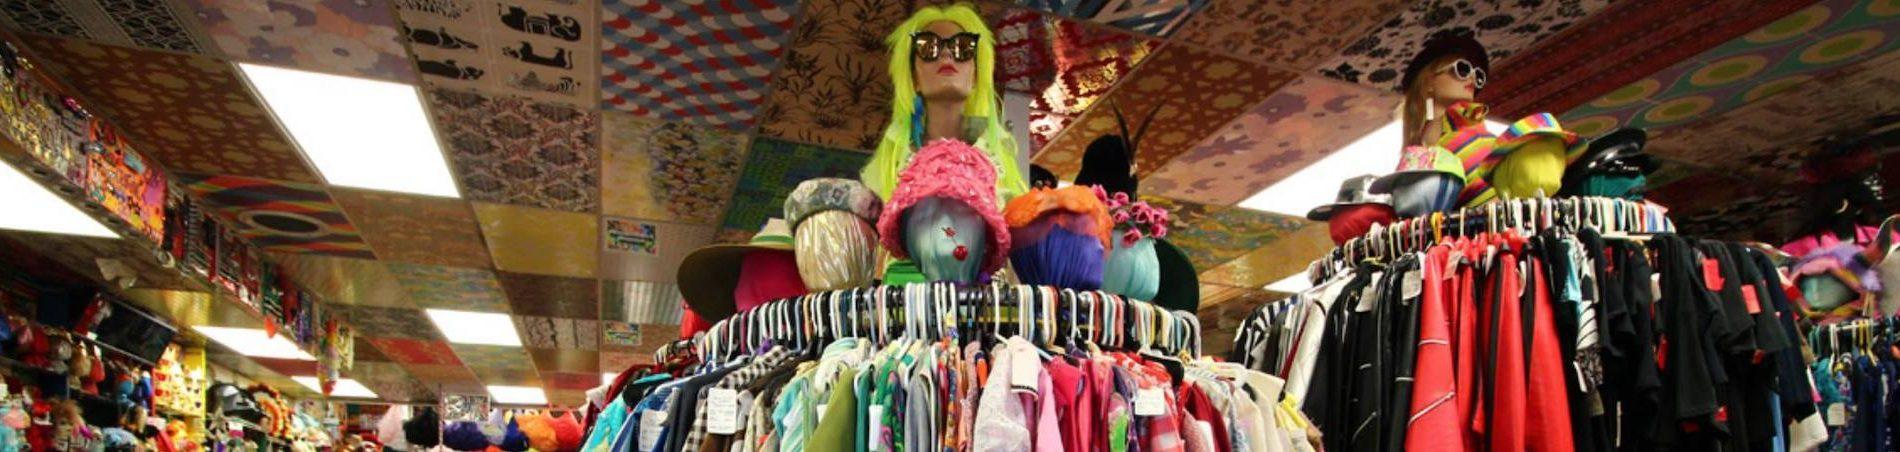 sydney costume shop